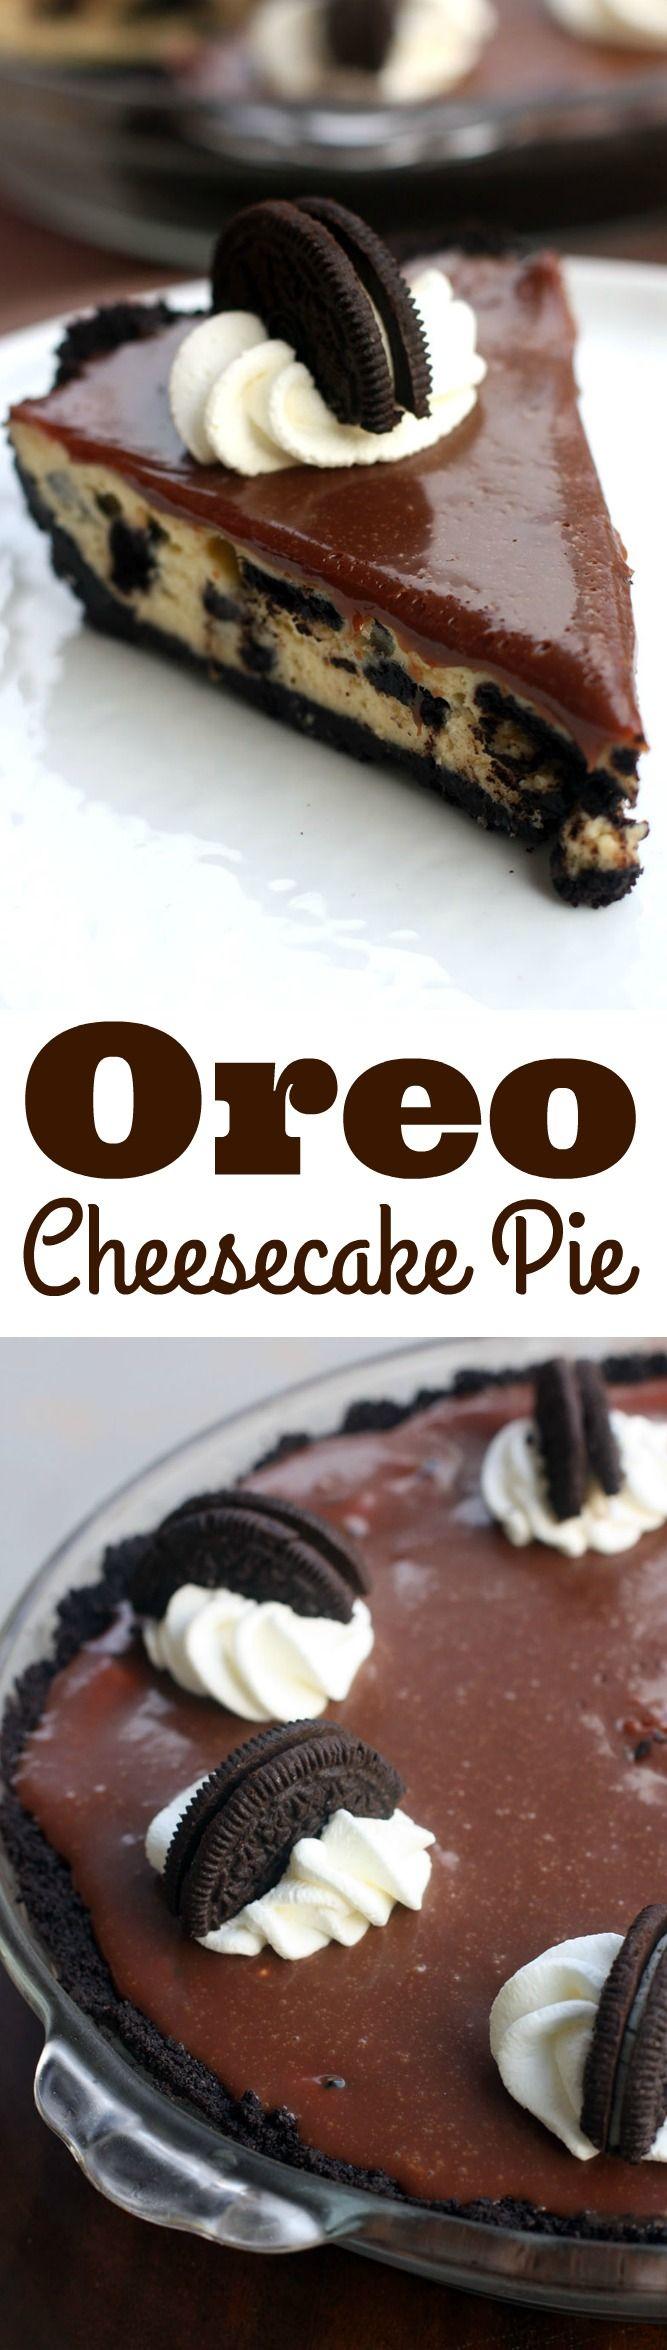 Oreo Cheesecake Pie Three Steps To The Easiest Oreo Cheesecake Ever The Best